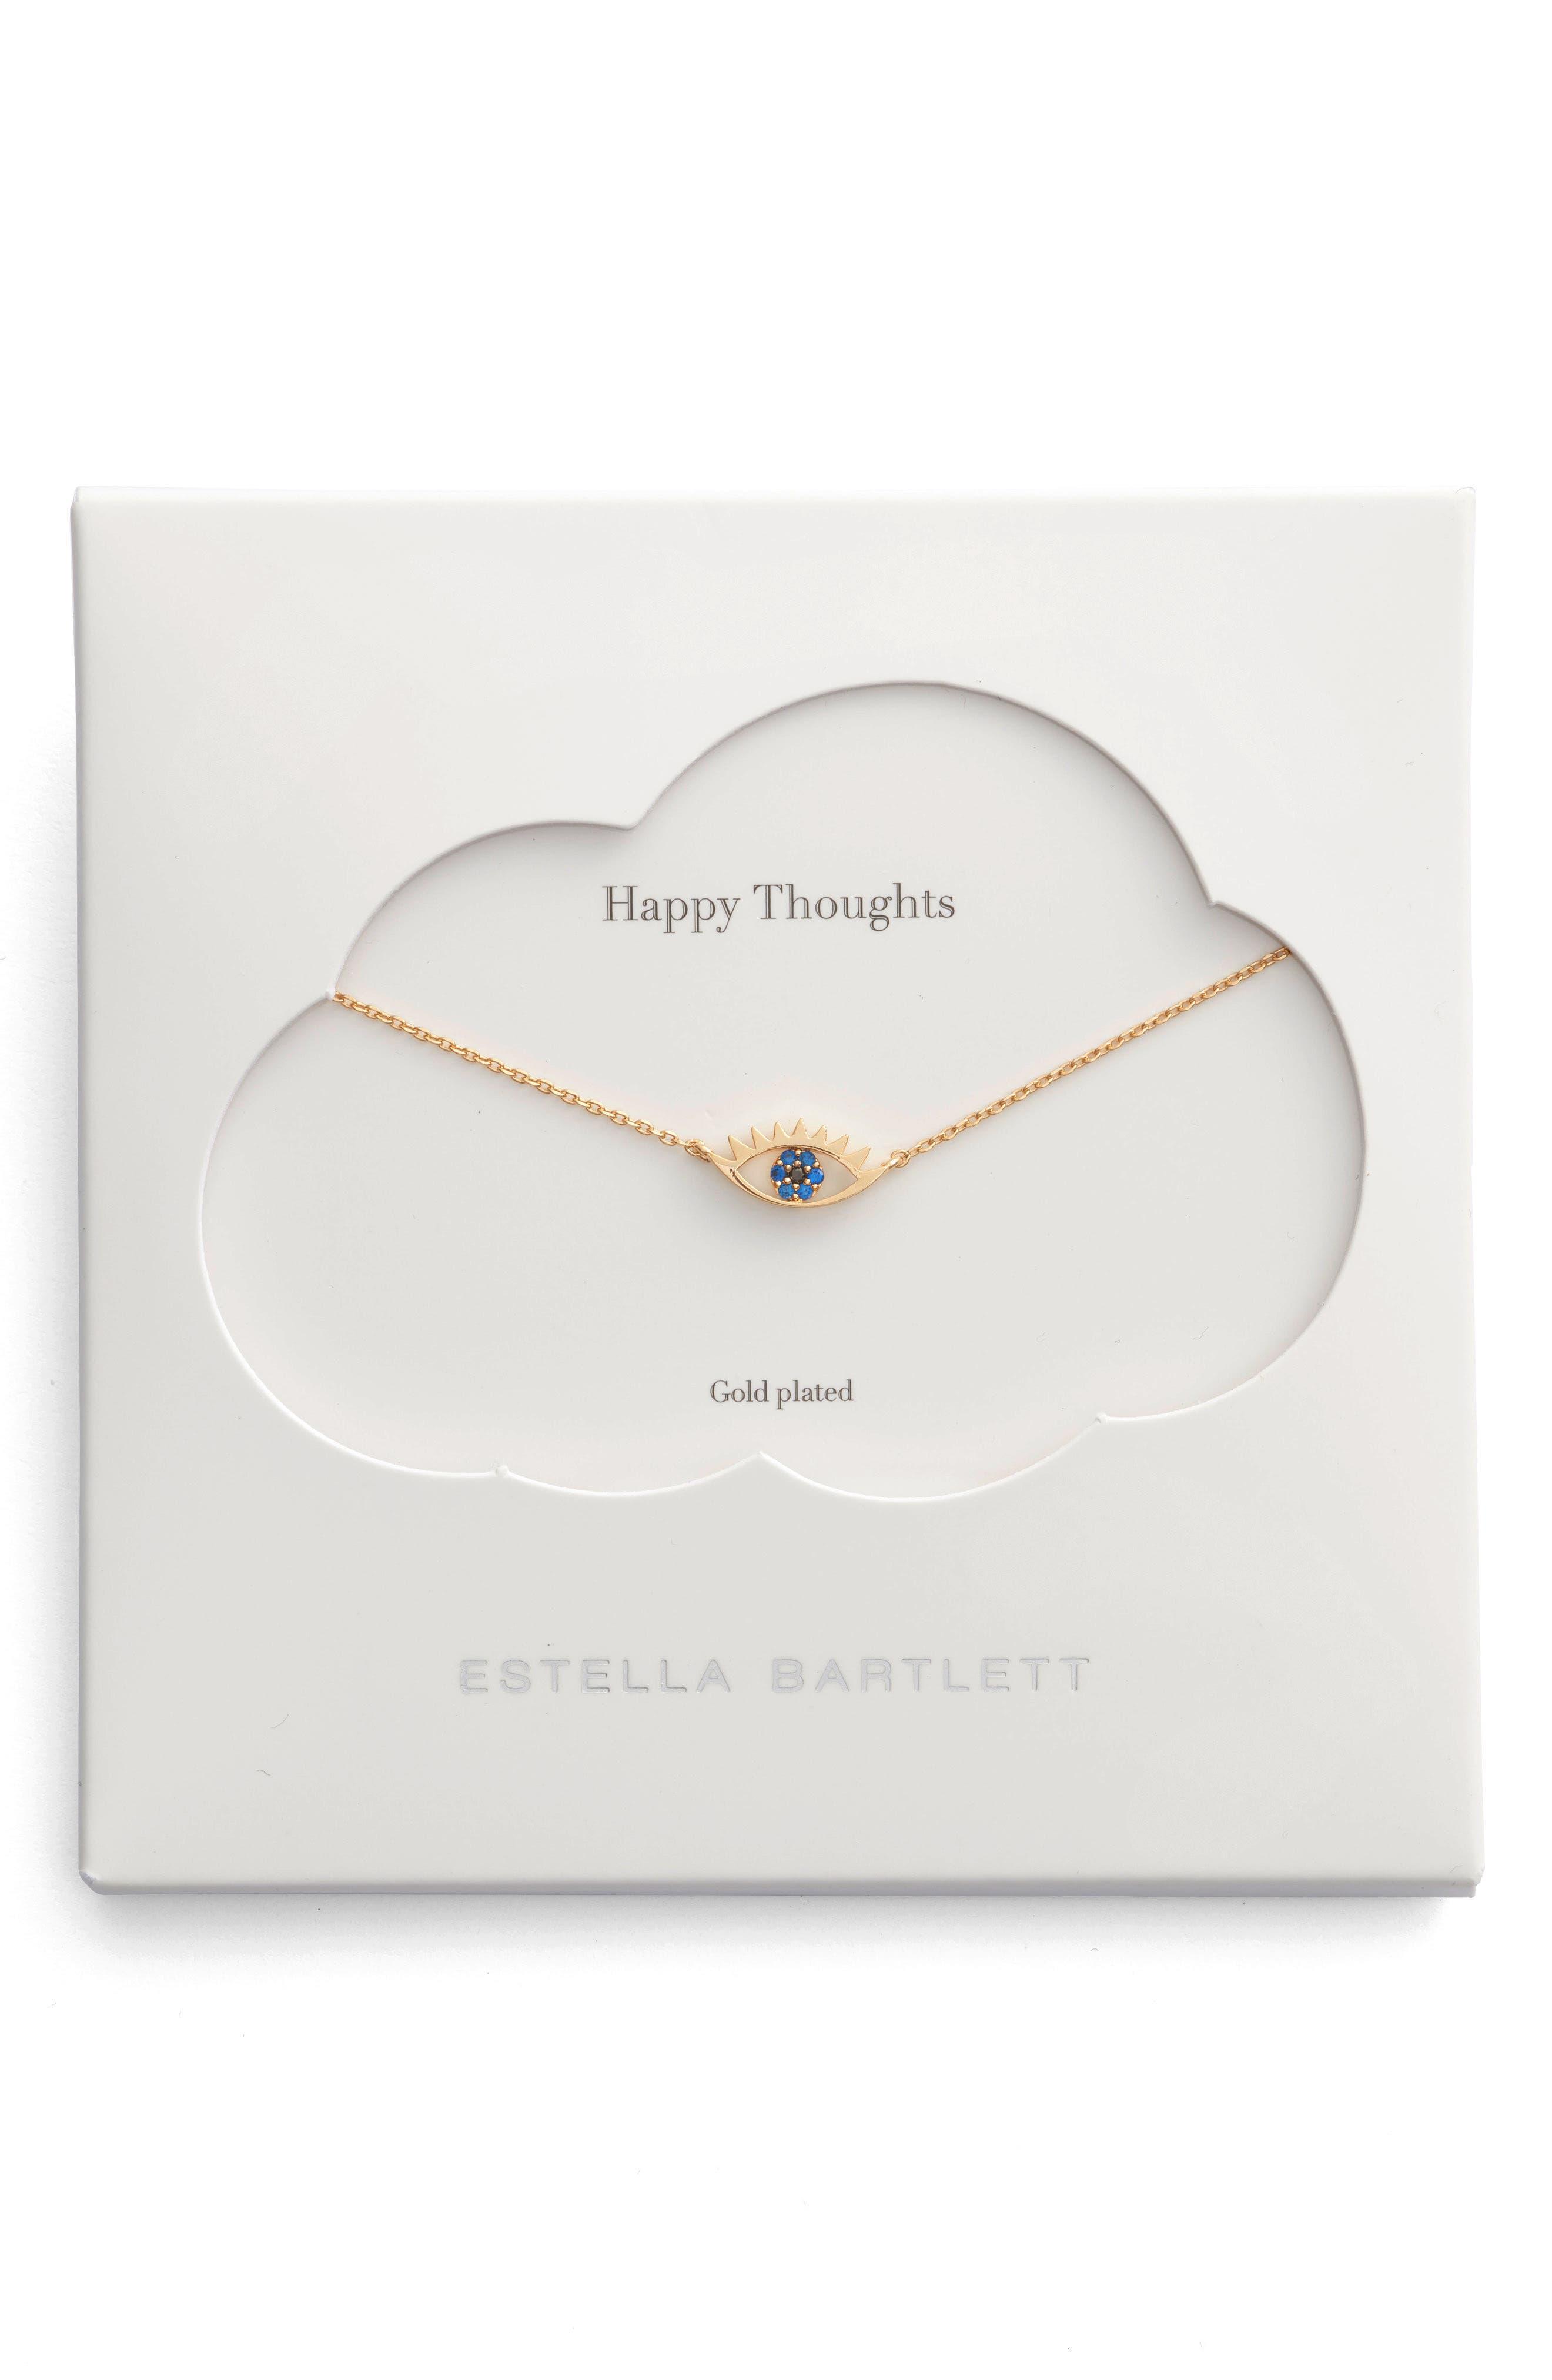 Estella Bartlett Happy Thoughts Eye Pendant Necklace